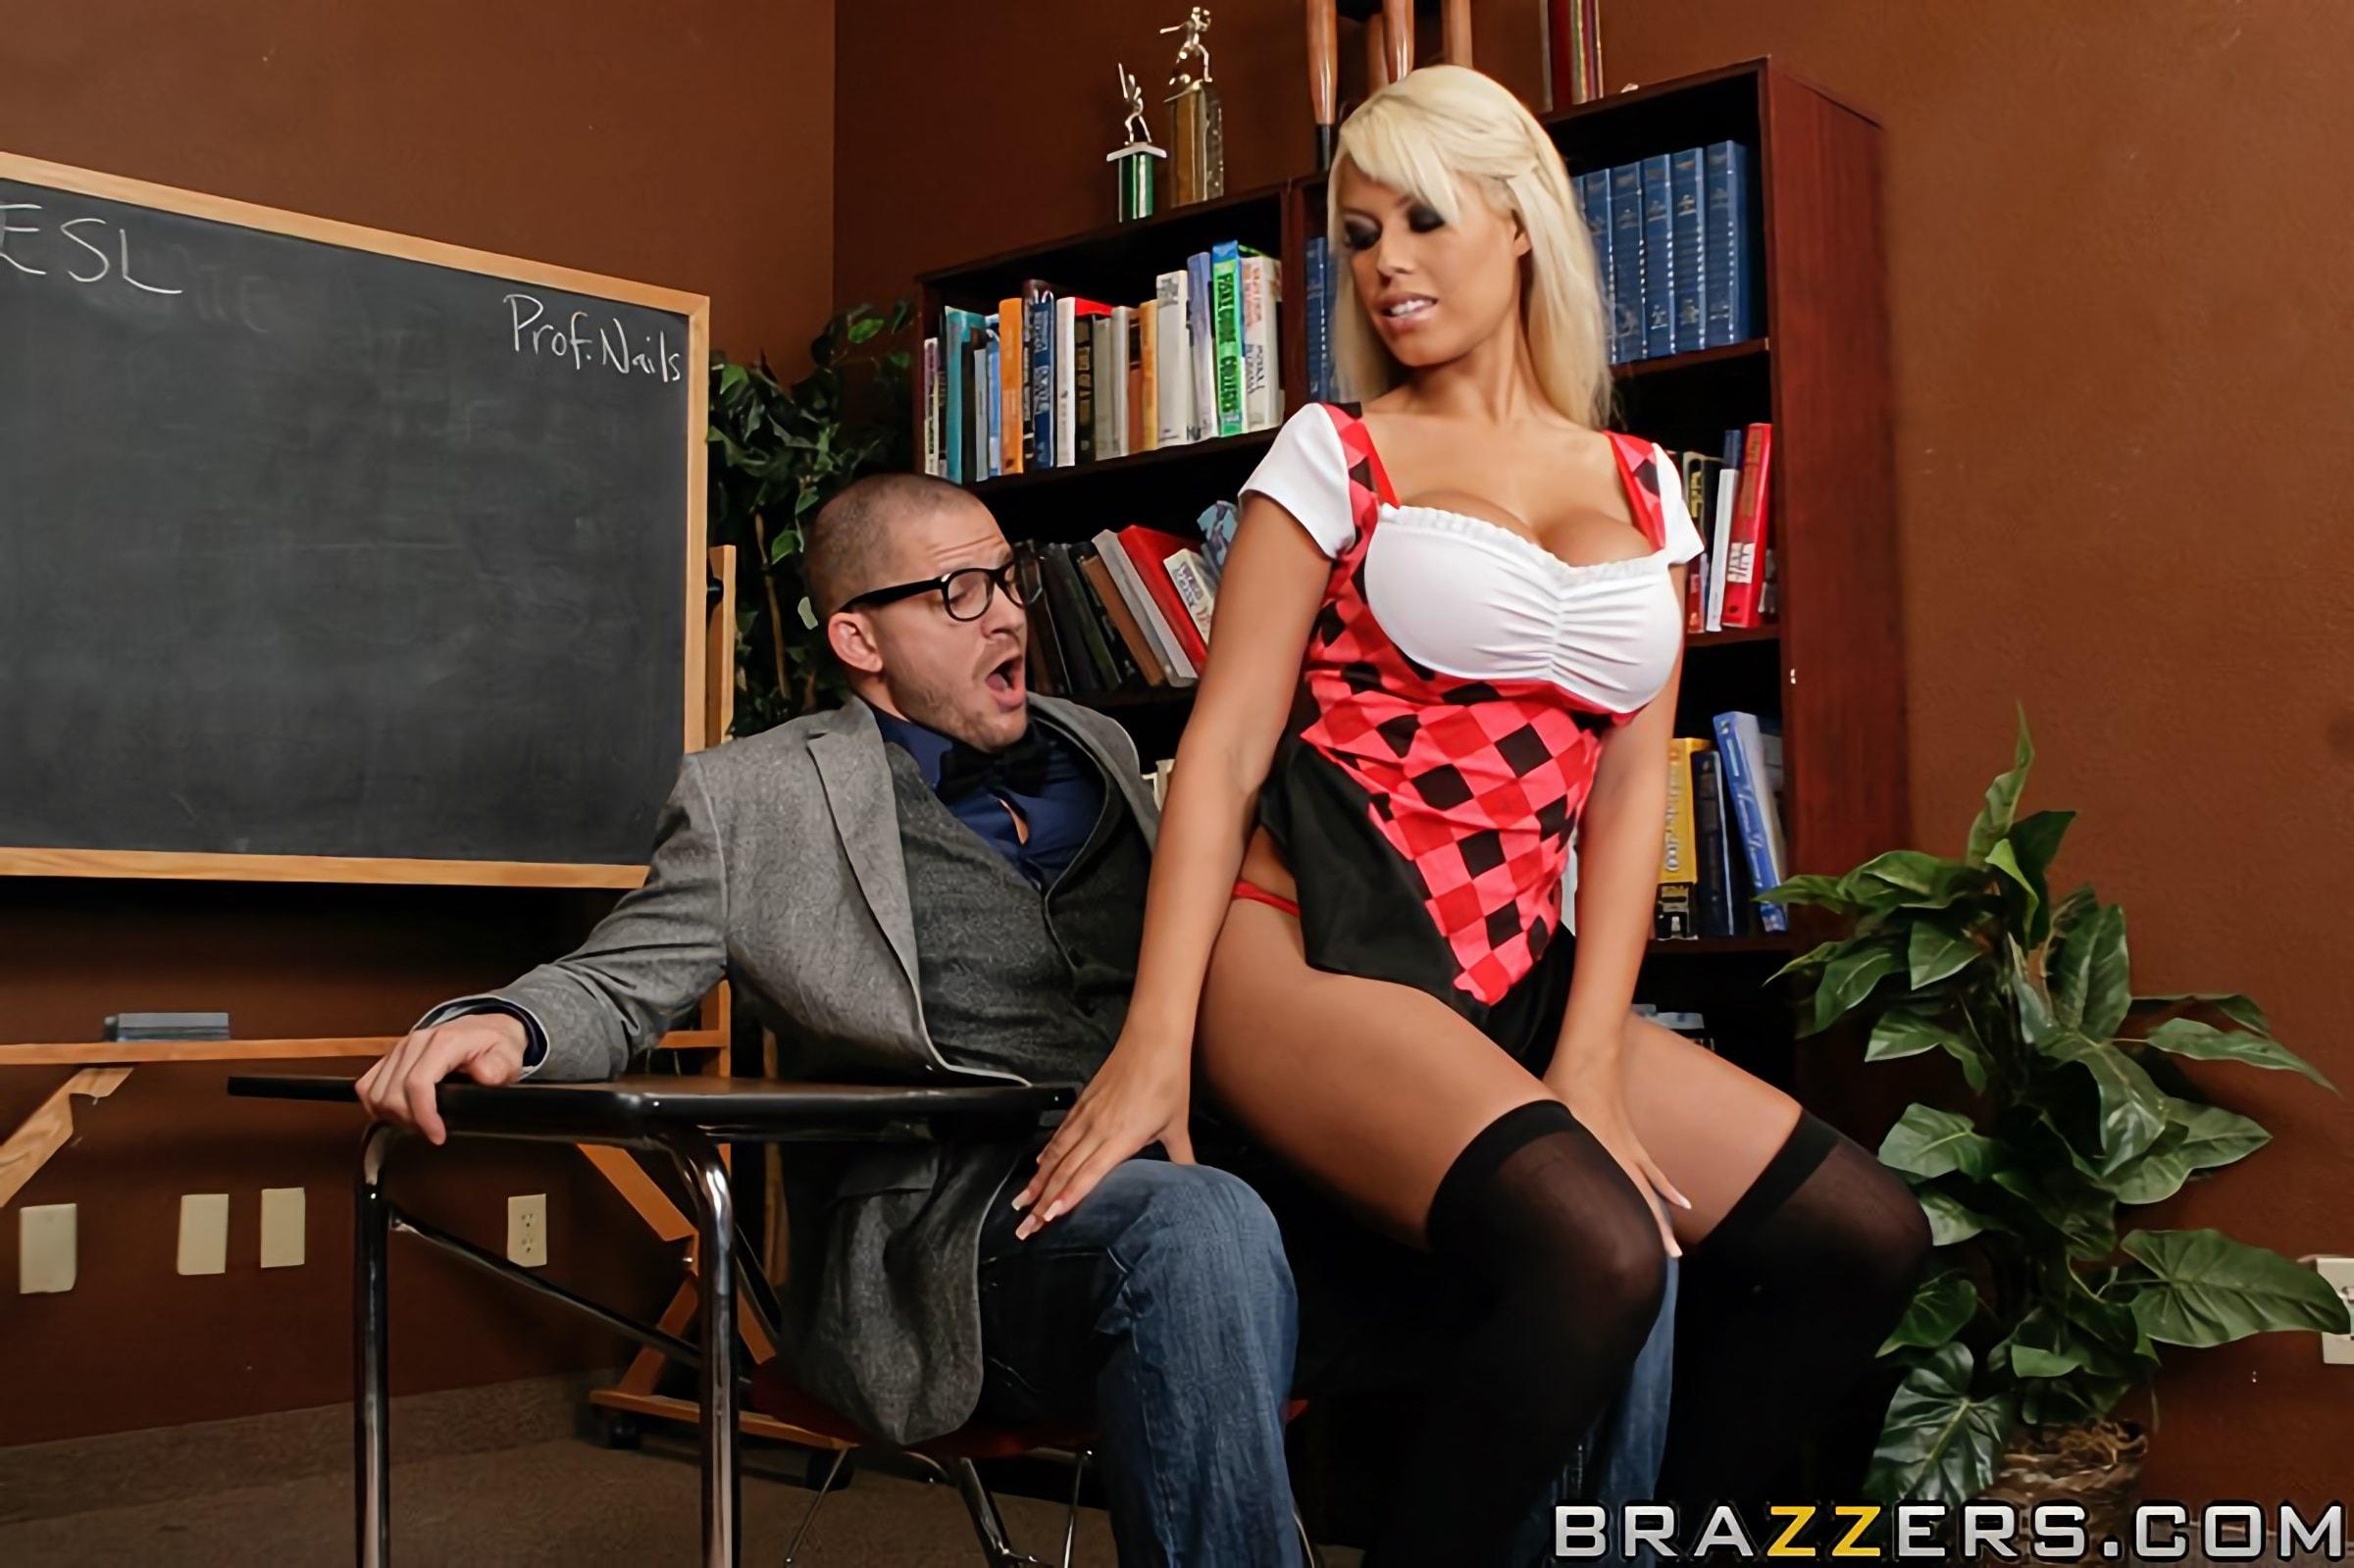 Brazzers 'Dick Is For Suck' starring Bridgette B (Photo 5)